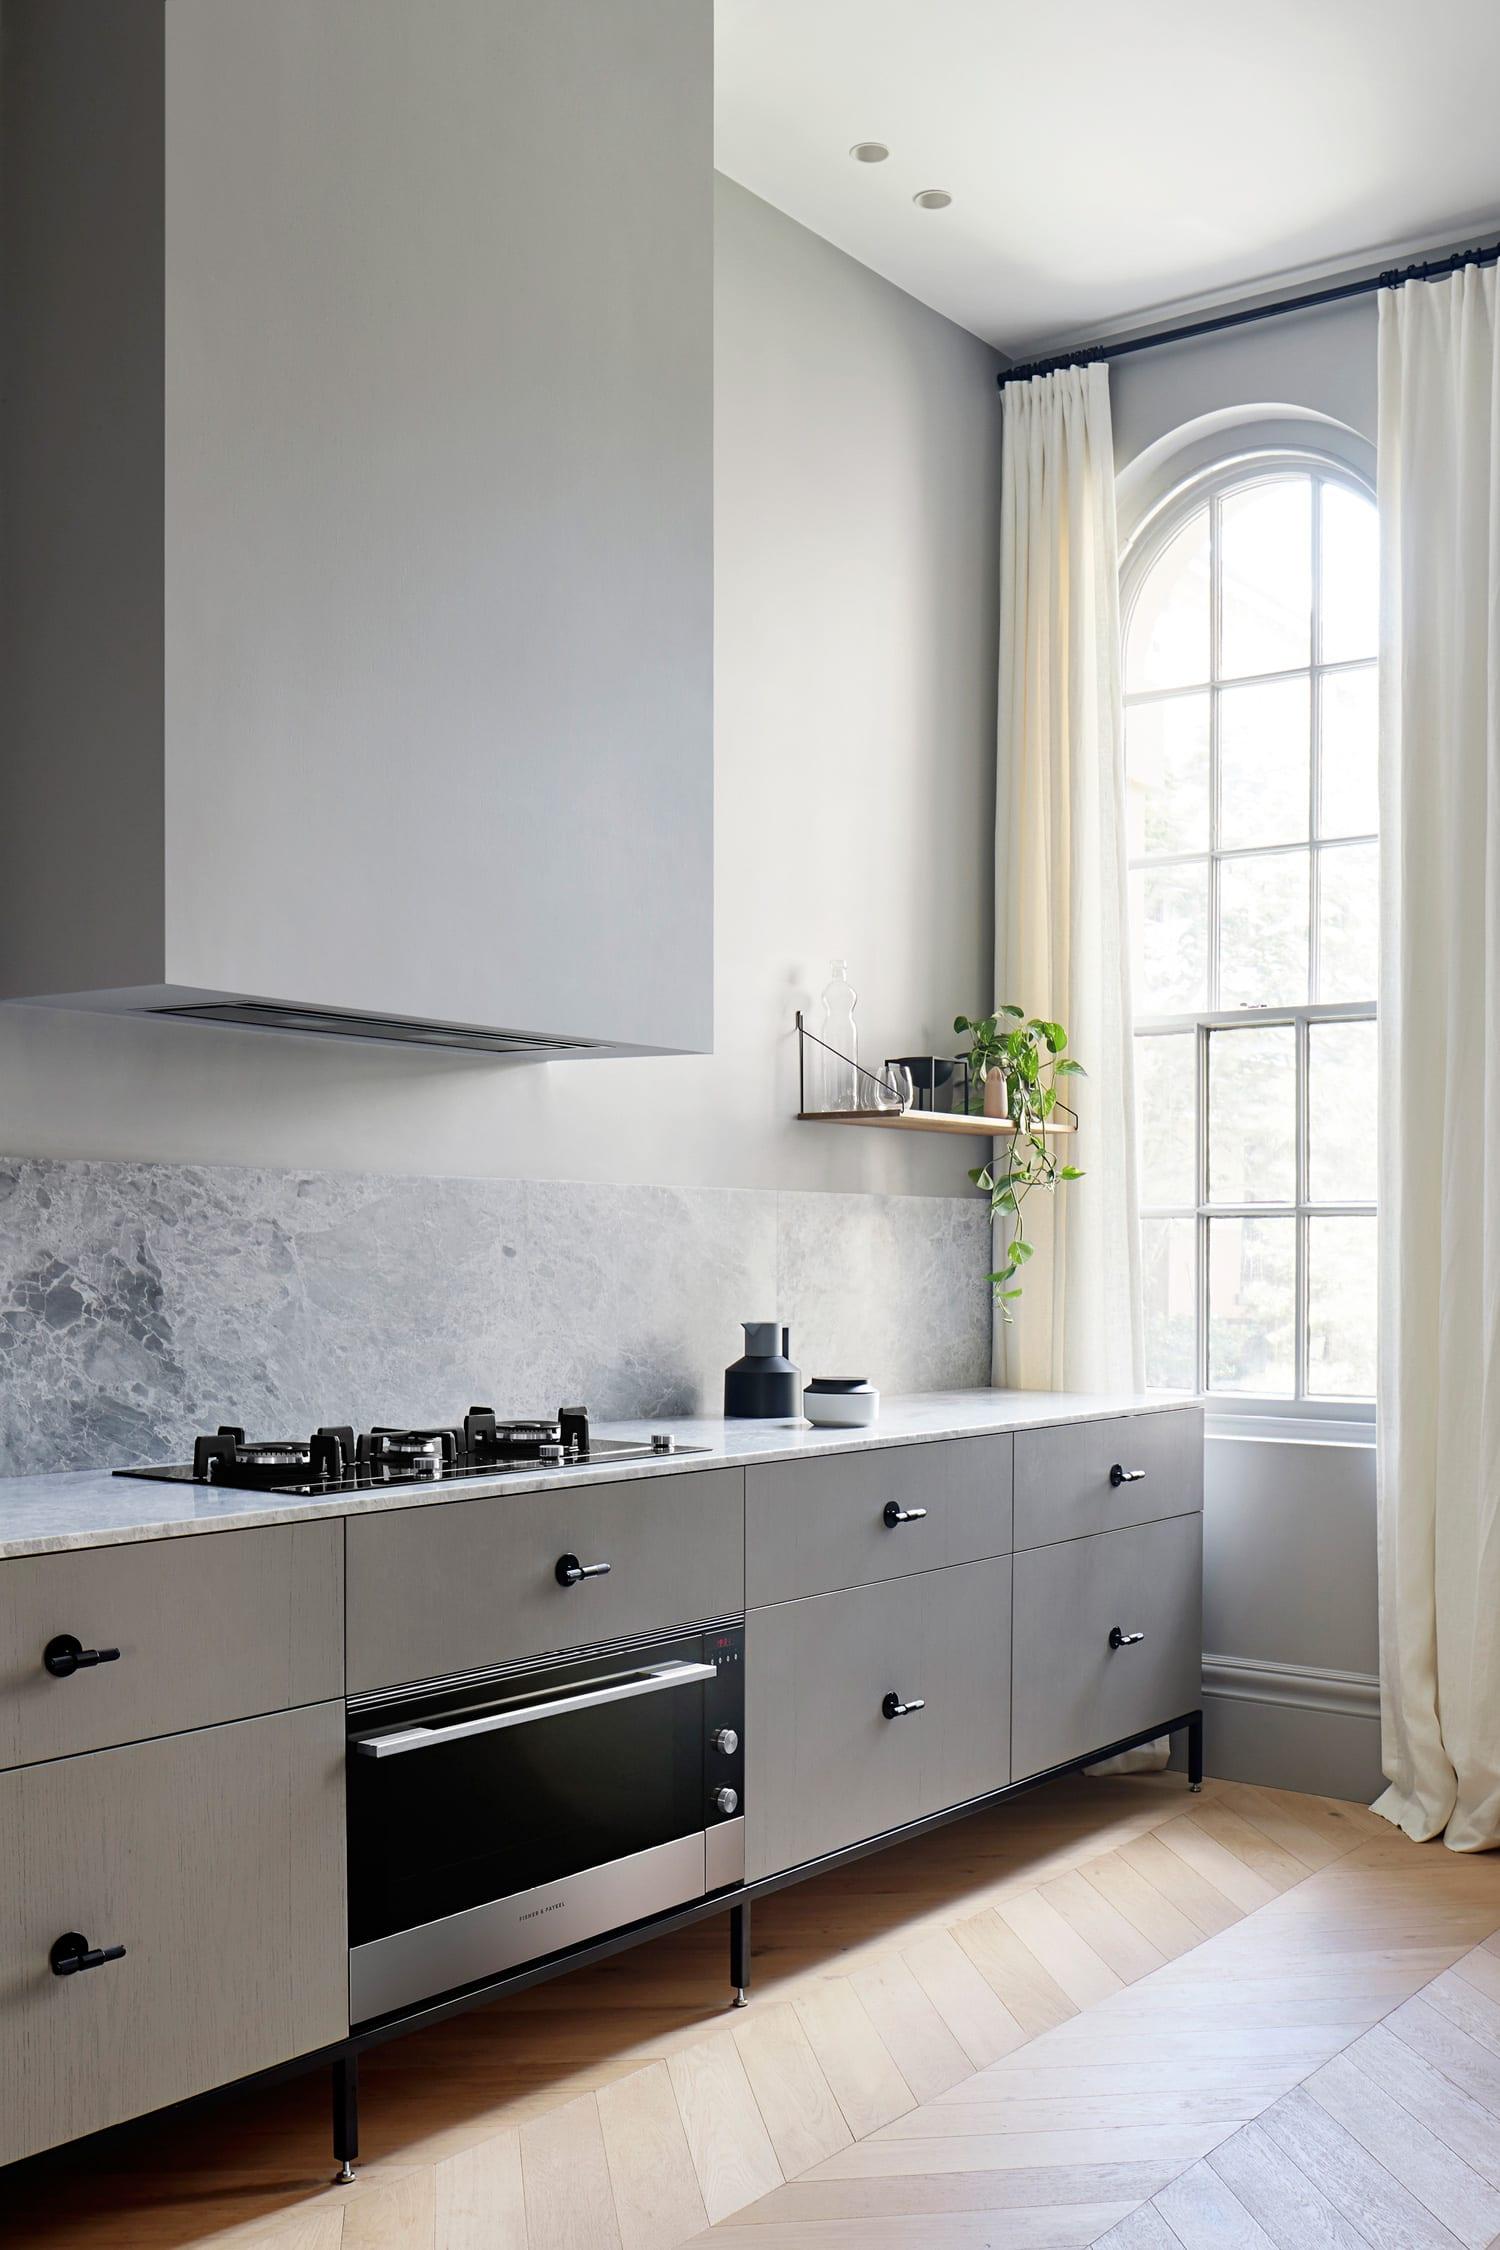 Sarah Wolfendale's Kew Apartment Set Inside a Former Lunatic Asylum | Yellowtrace